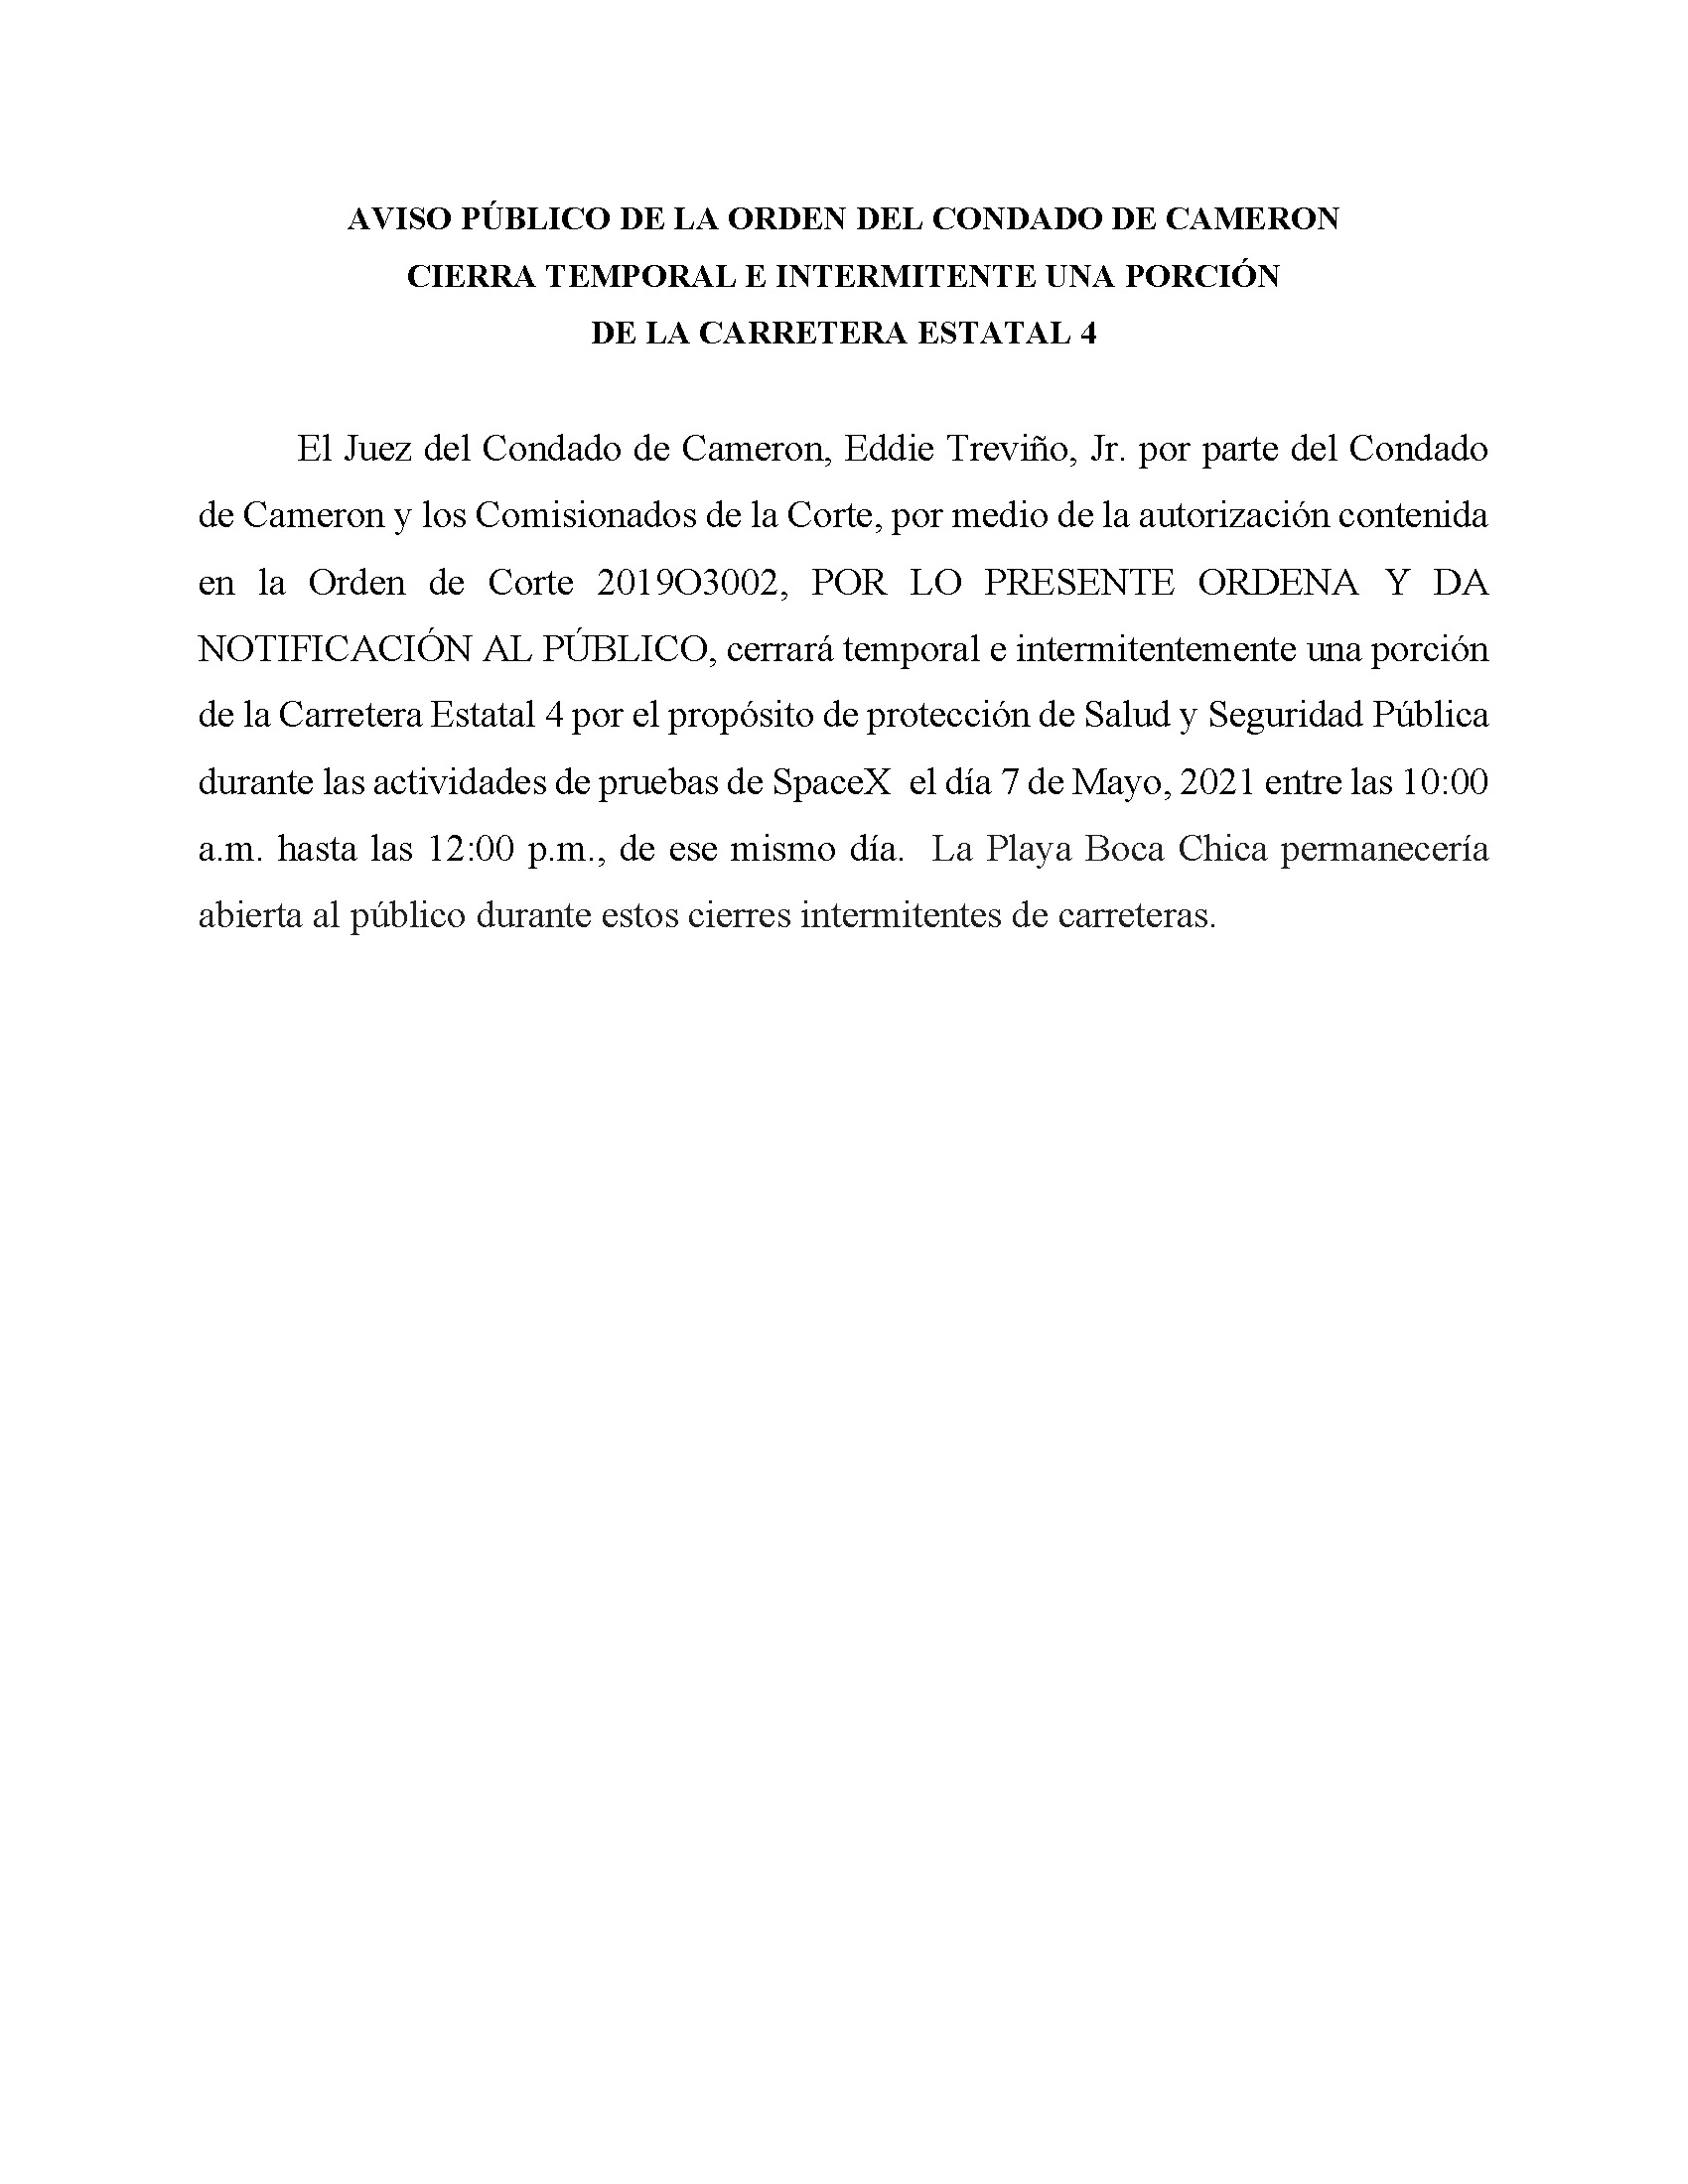 ORDER.CLOSURE OF HIGHWAY 4.SPANISH.05.07.2021